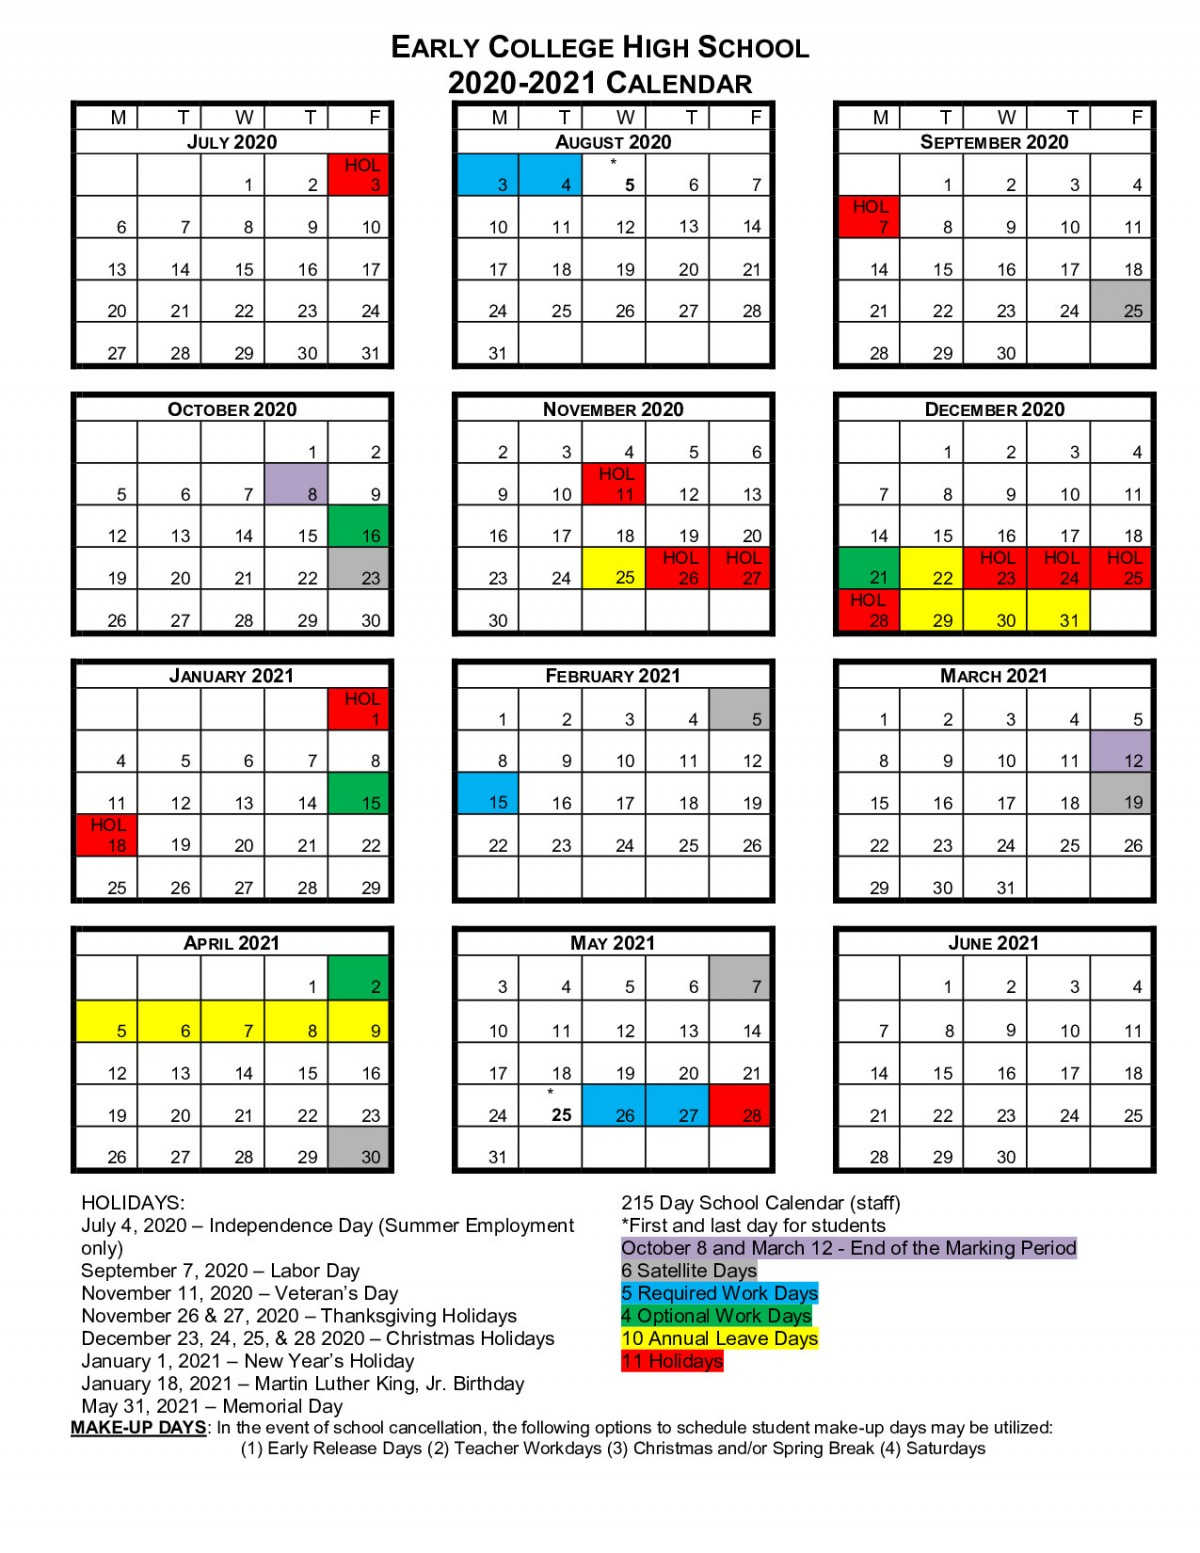 Bcs School Calendars | Beaufort County Schools Intended For Houston Countyboard Of Education Calendar 2021